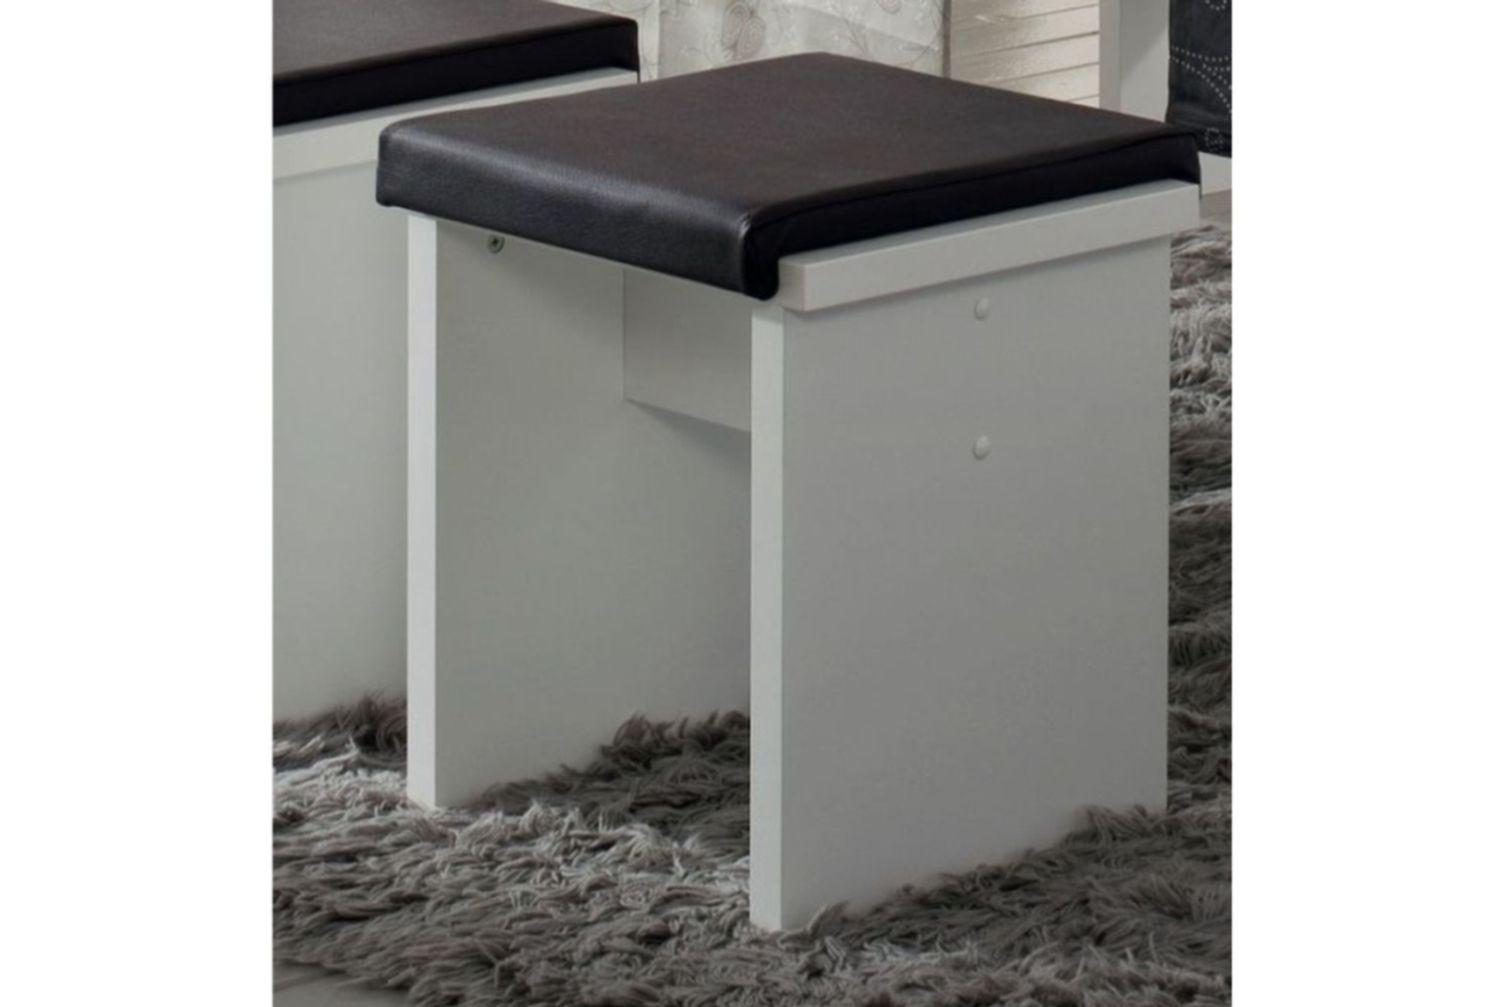 sitzhocker neu stuhl dielenhocker hocker barhocker holz. Black Bedroom Furniture Sets. Home Design Ideas